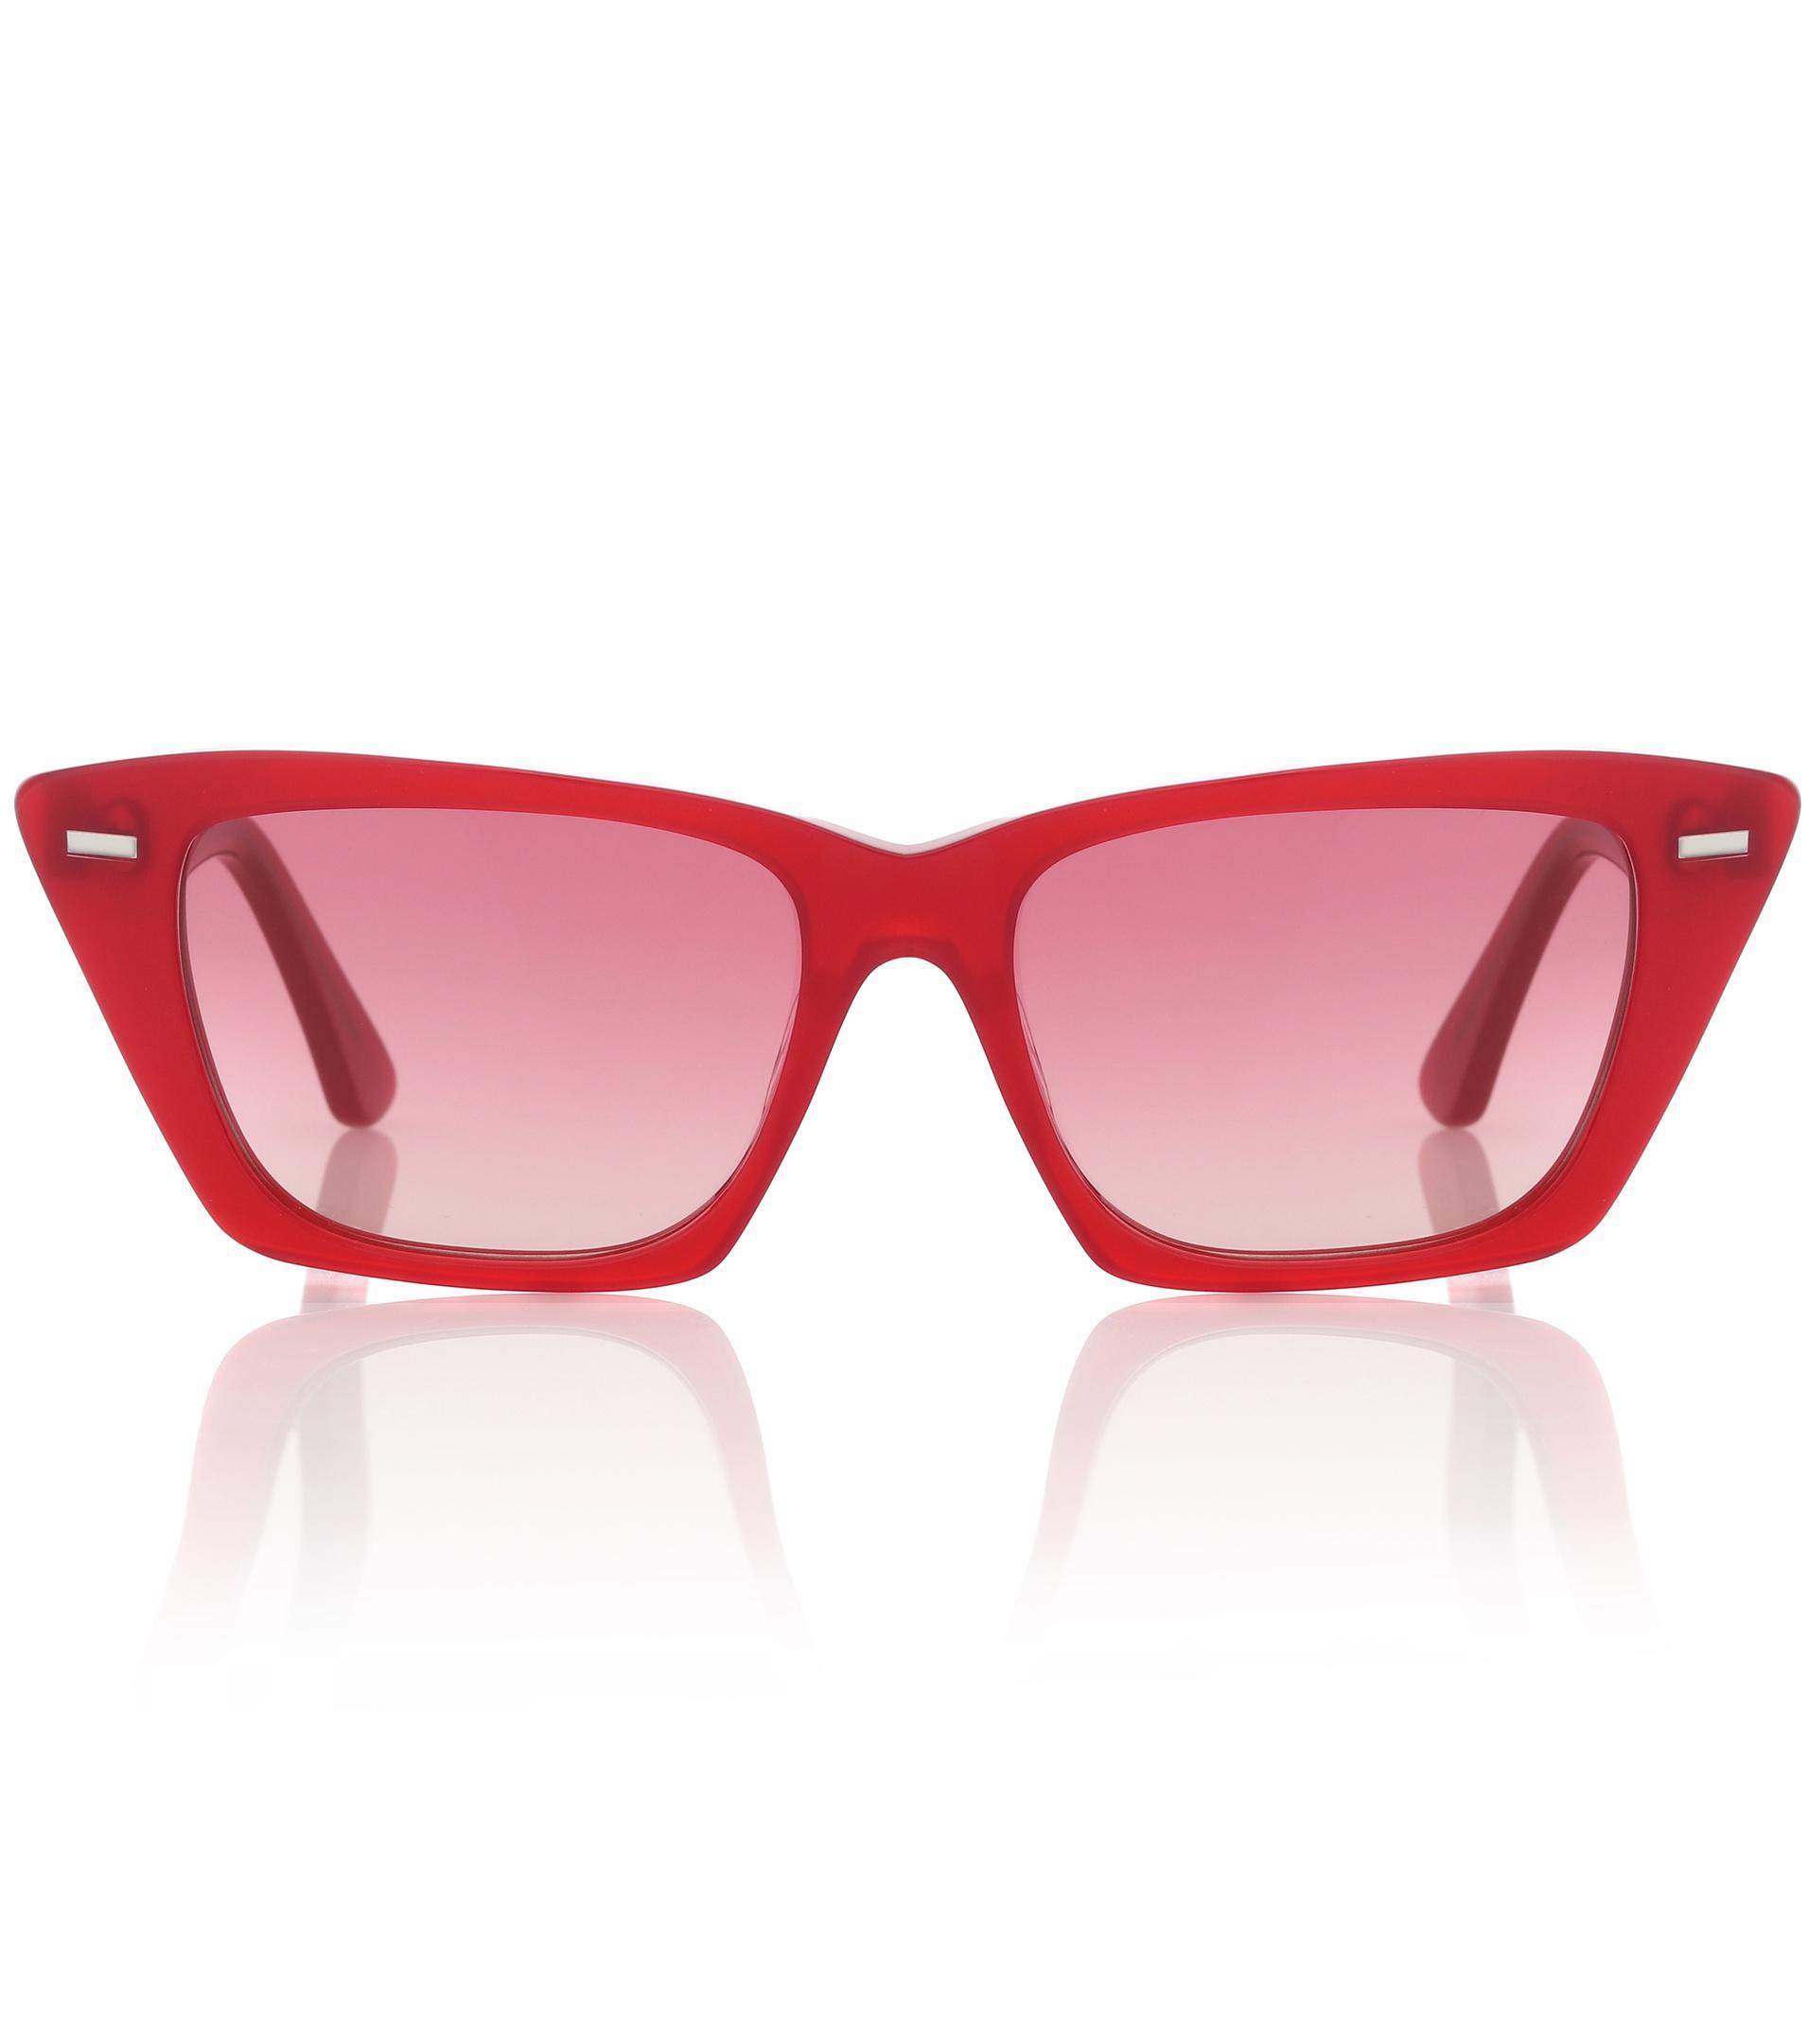 392991b264 Lyst - Acne Studios Ingrid Cat-eye Sunglasses in Red - Save 70%